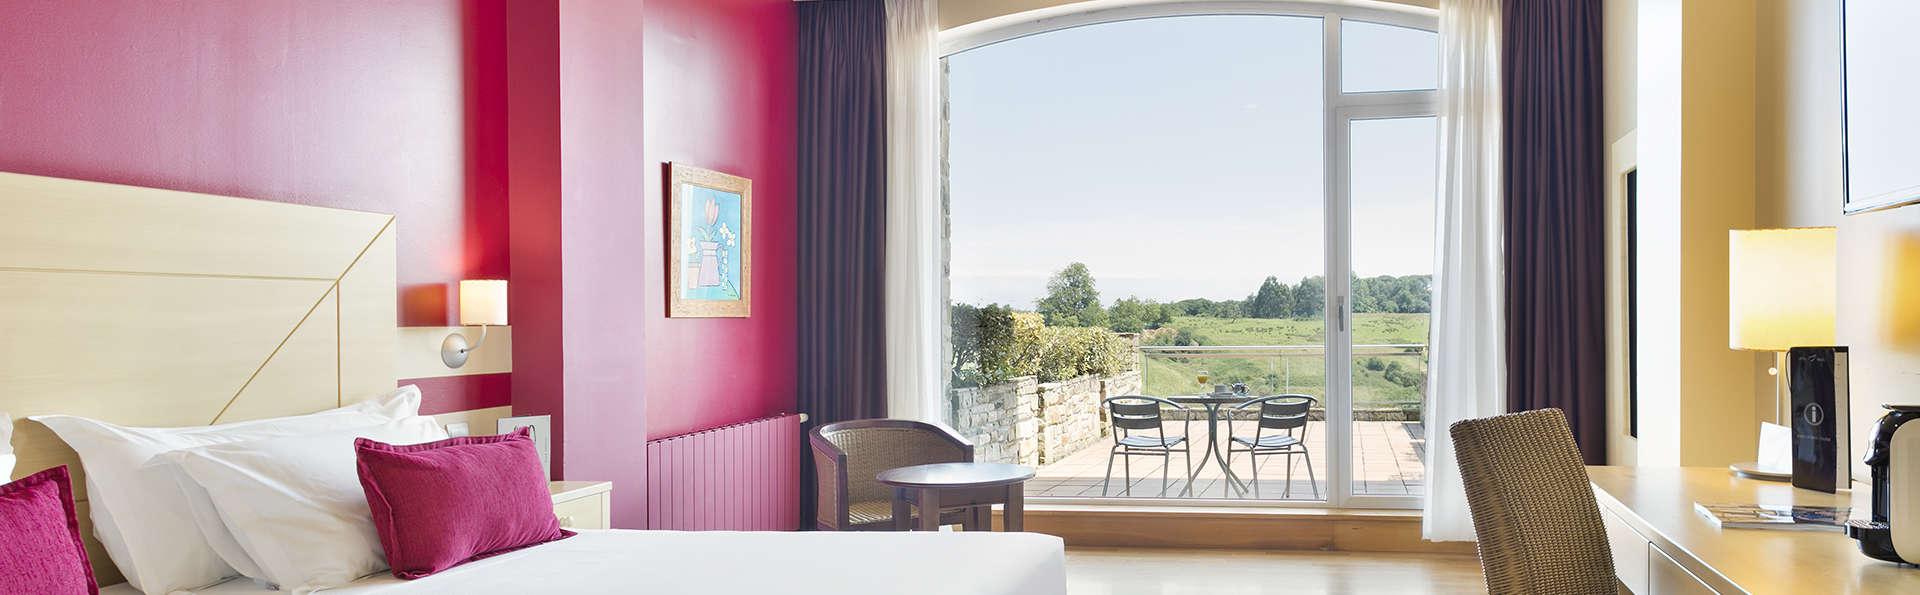 Abba Comillas Golf Hotel - EDIT_ROOM_DELUXE.jpg